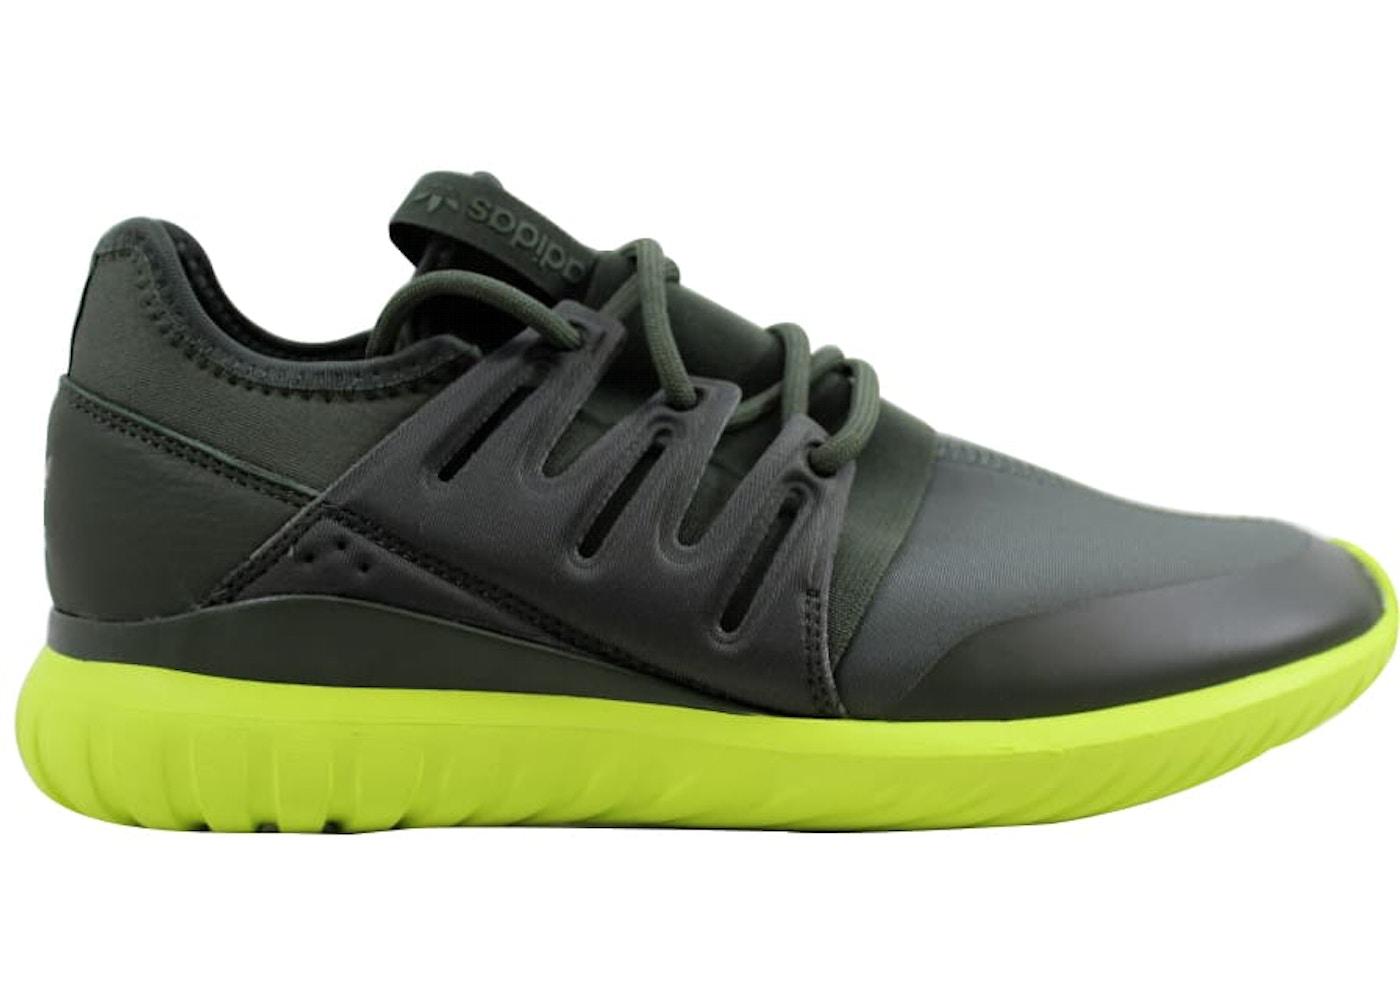 8df28c6d72f8 adidas Tubular Radial Shadow Green - S75394